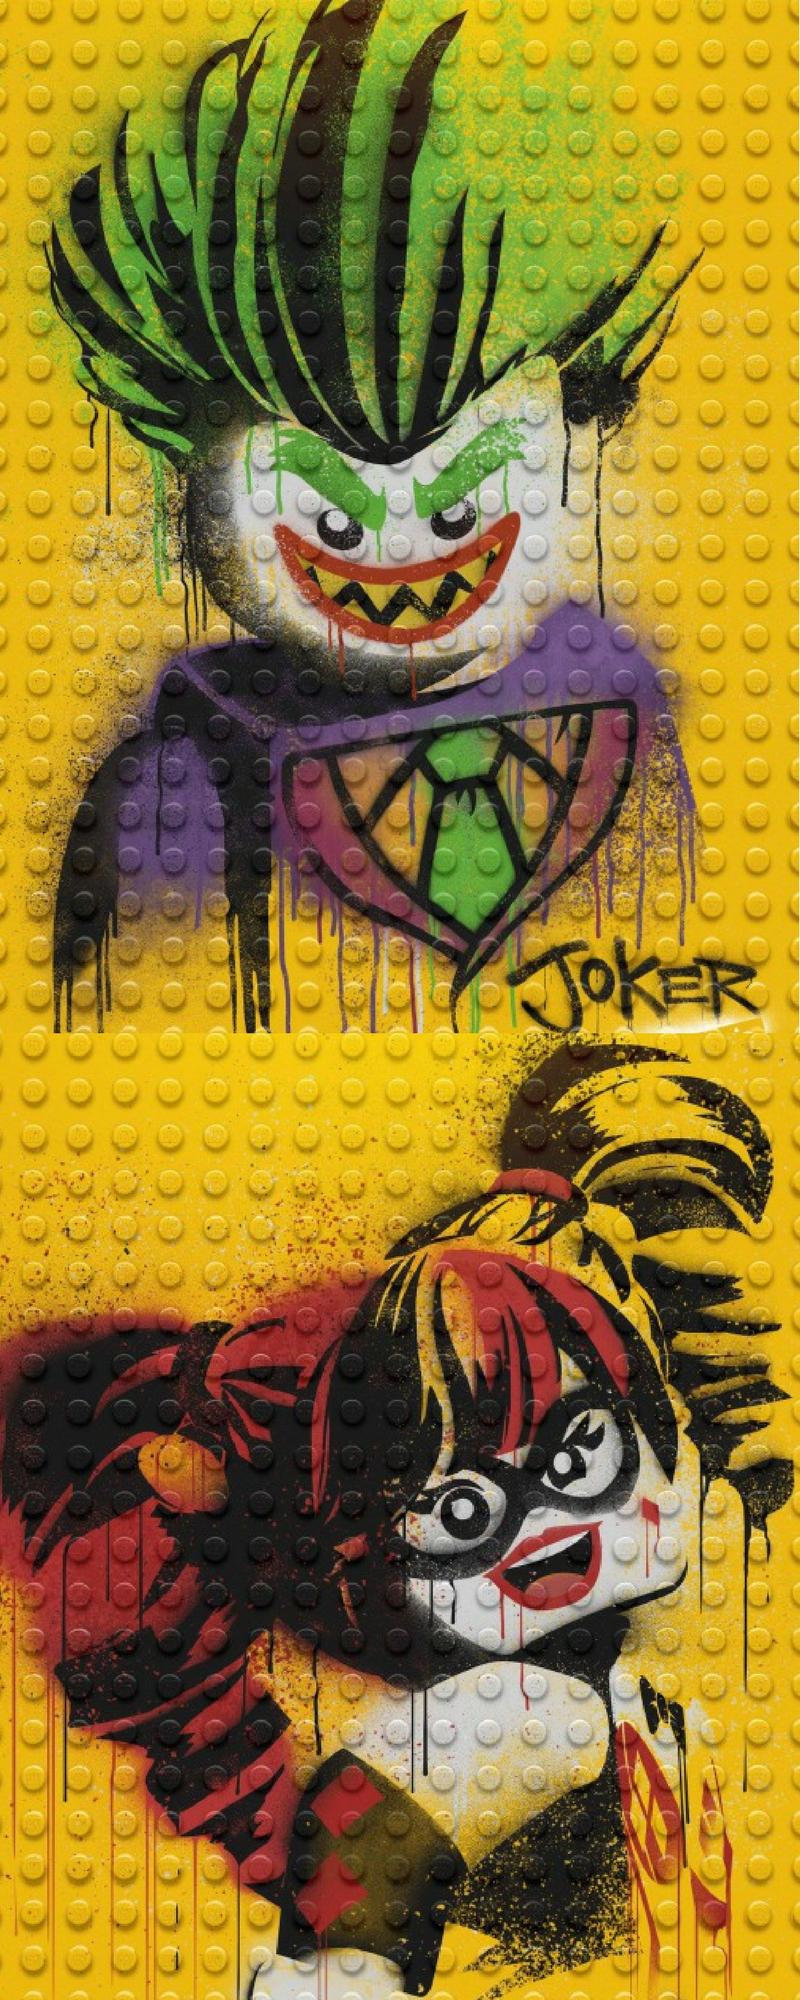 Lego Batman artwork of the Gothan super villain couple... The joker and Harley Quinn .